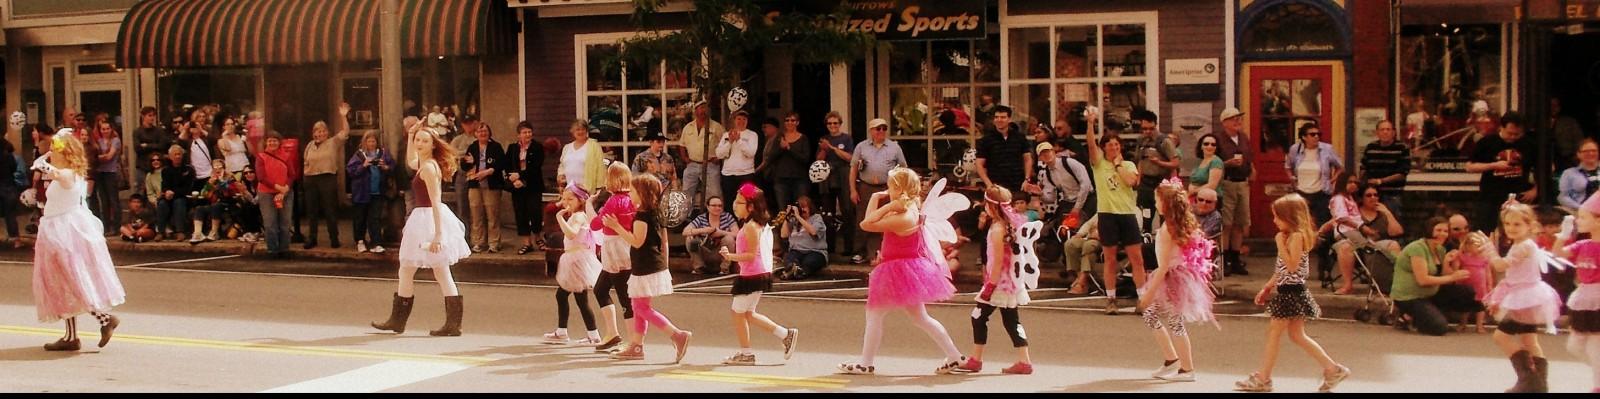 Small Town Parades